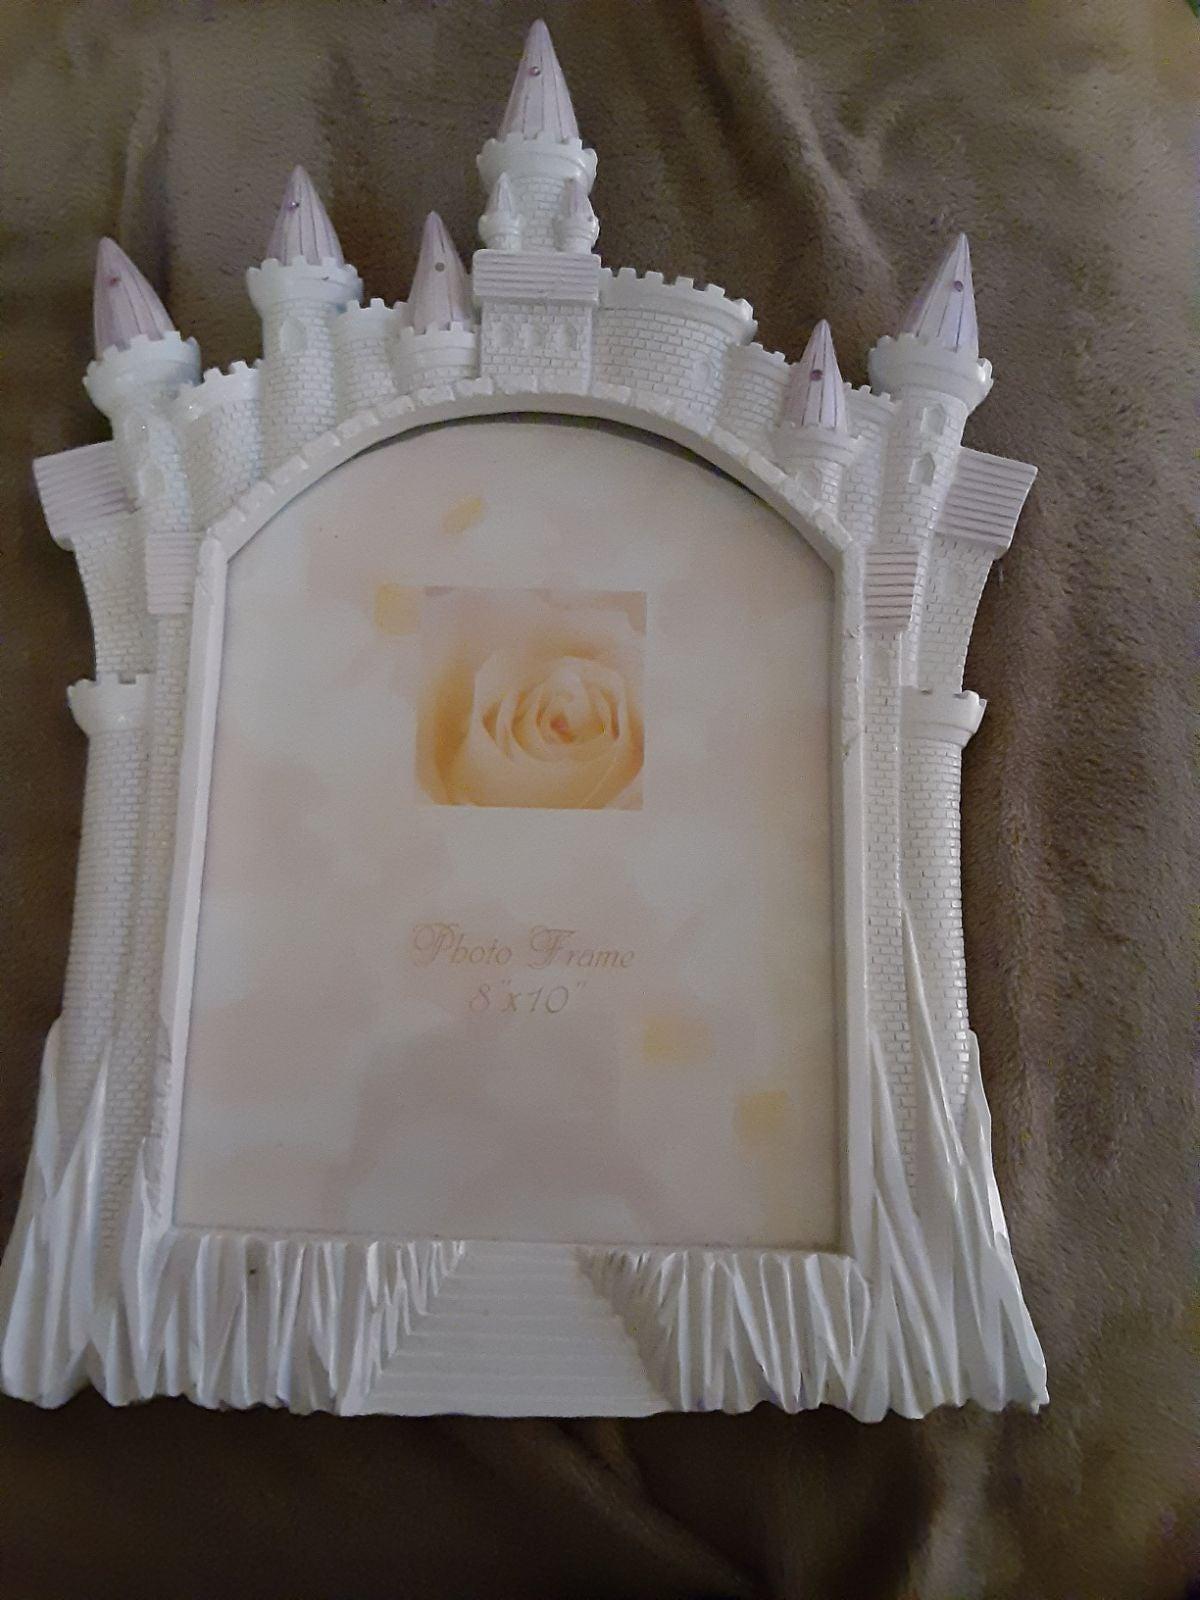 Cinderella's castle picture frame